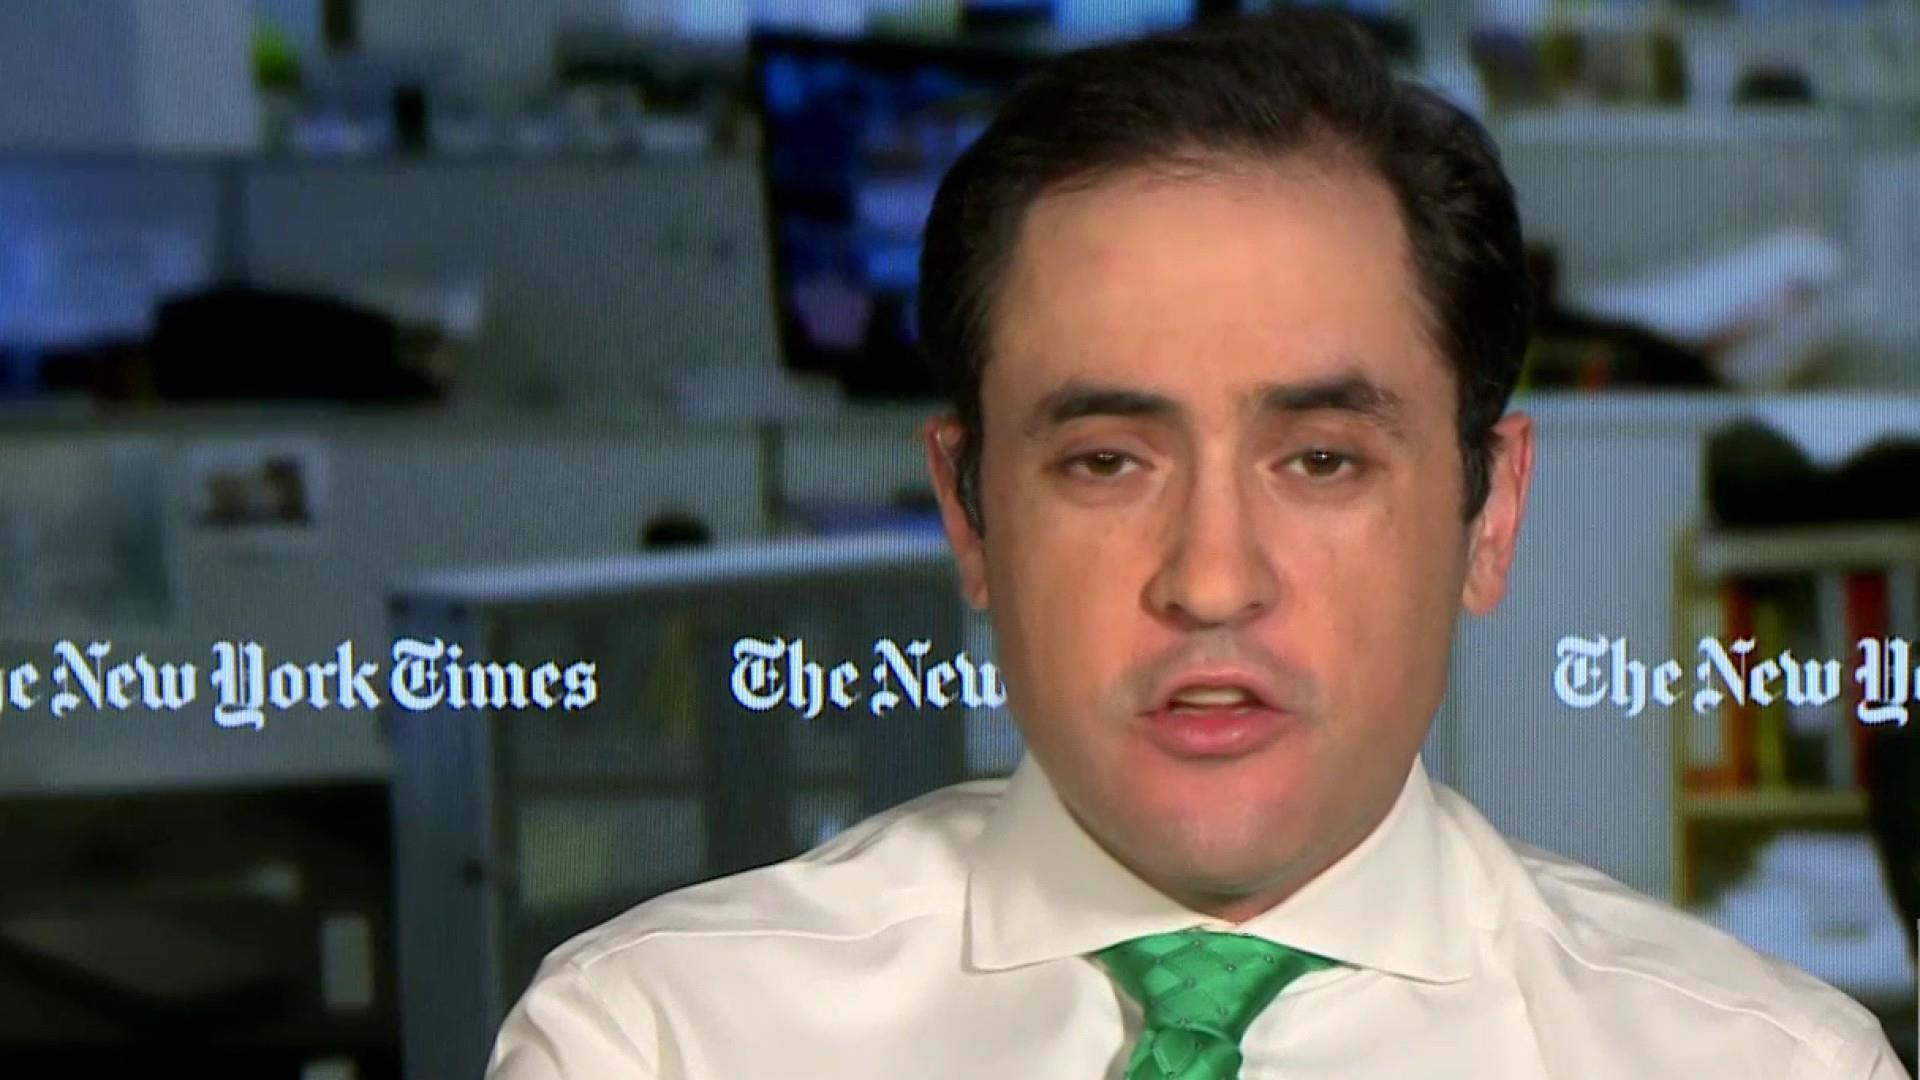 Sondland testimony creates pressure on Pompeo, Mulvaney and Bolton: NYTimes